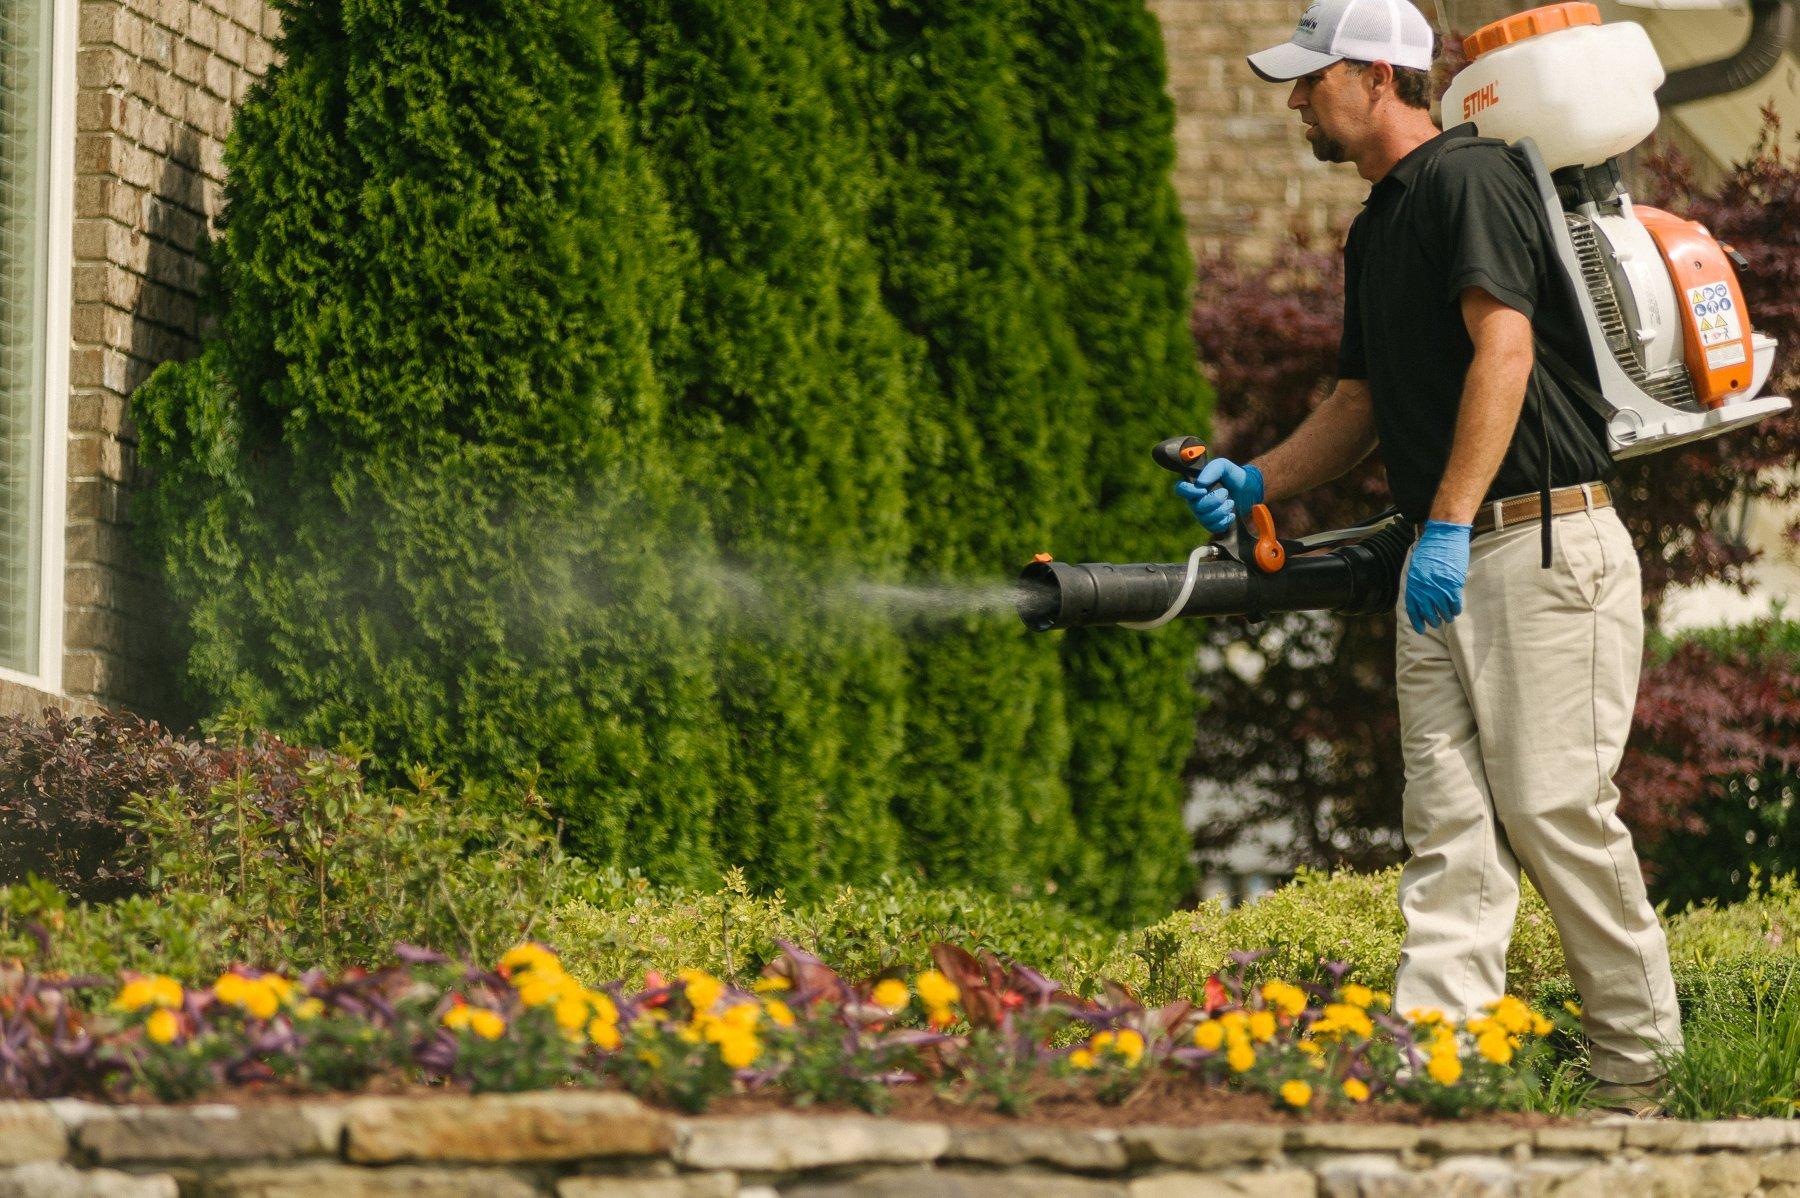 Technician spraying mosquito control